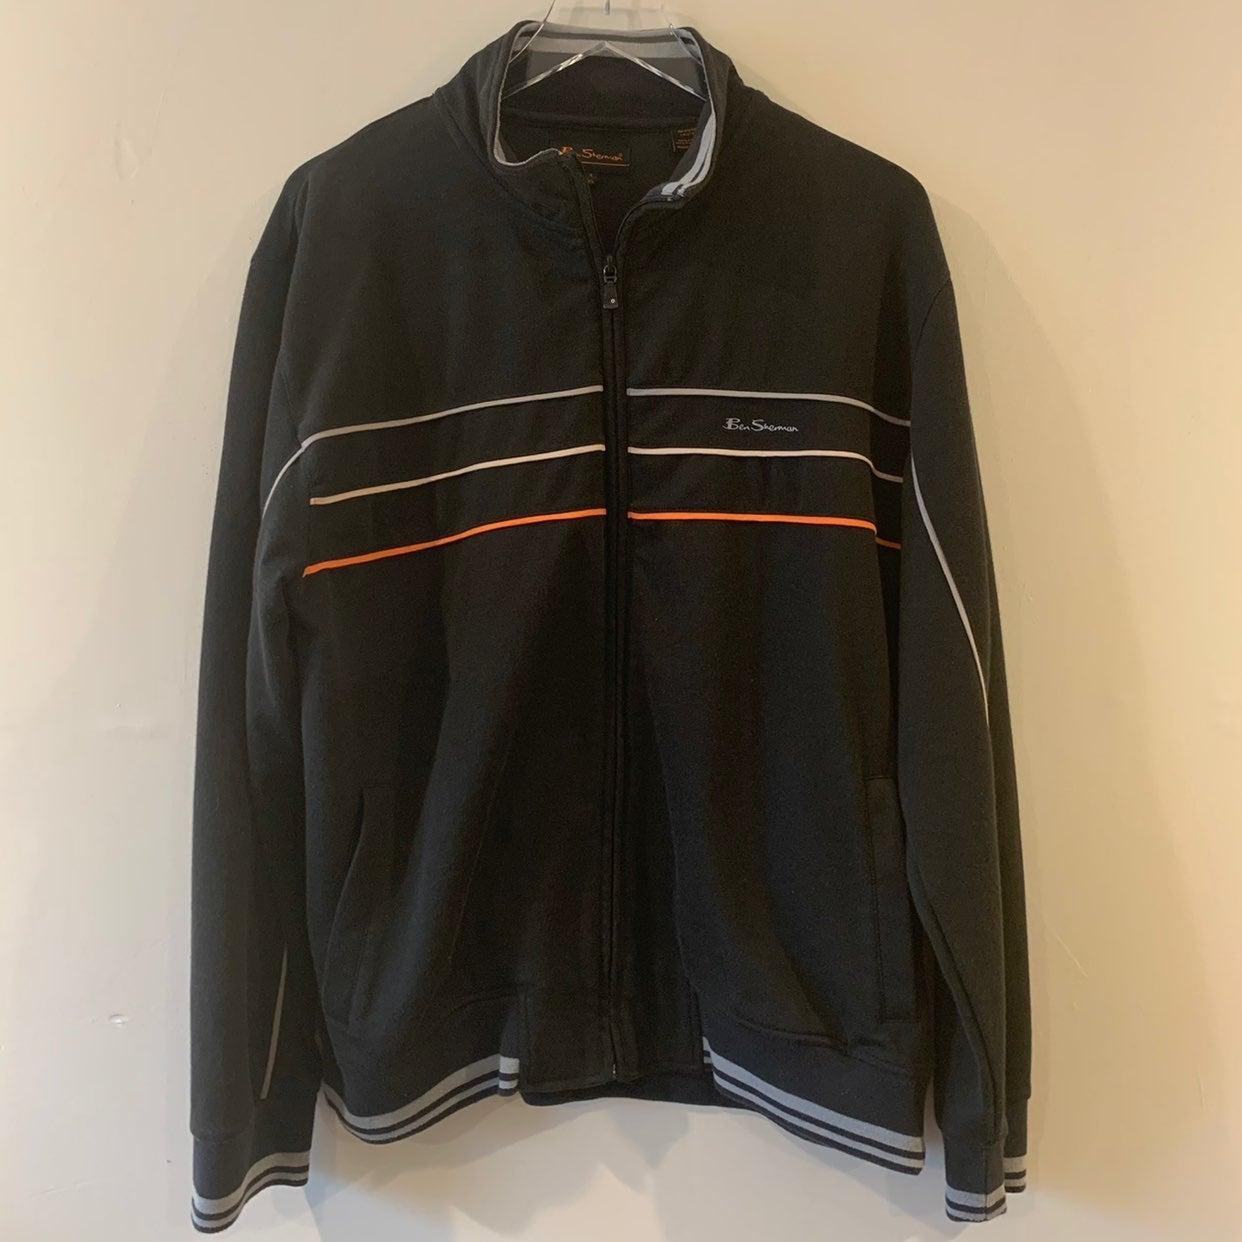 ben sherman mens zip jacket black and or